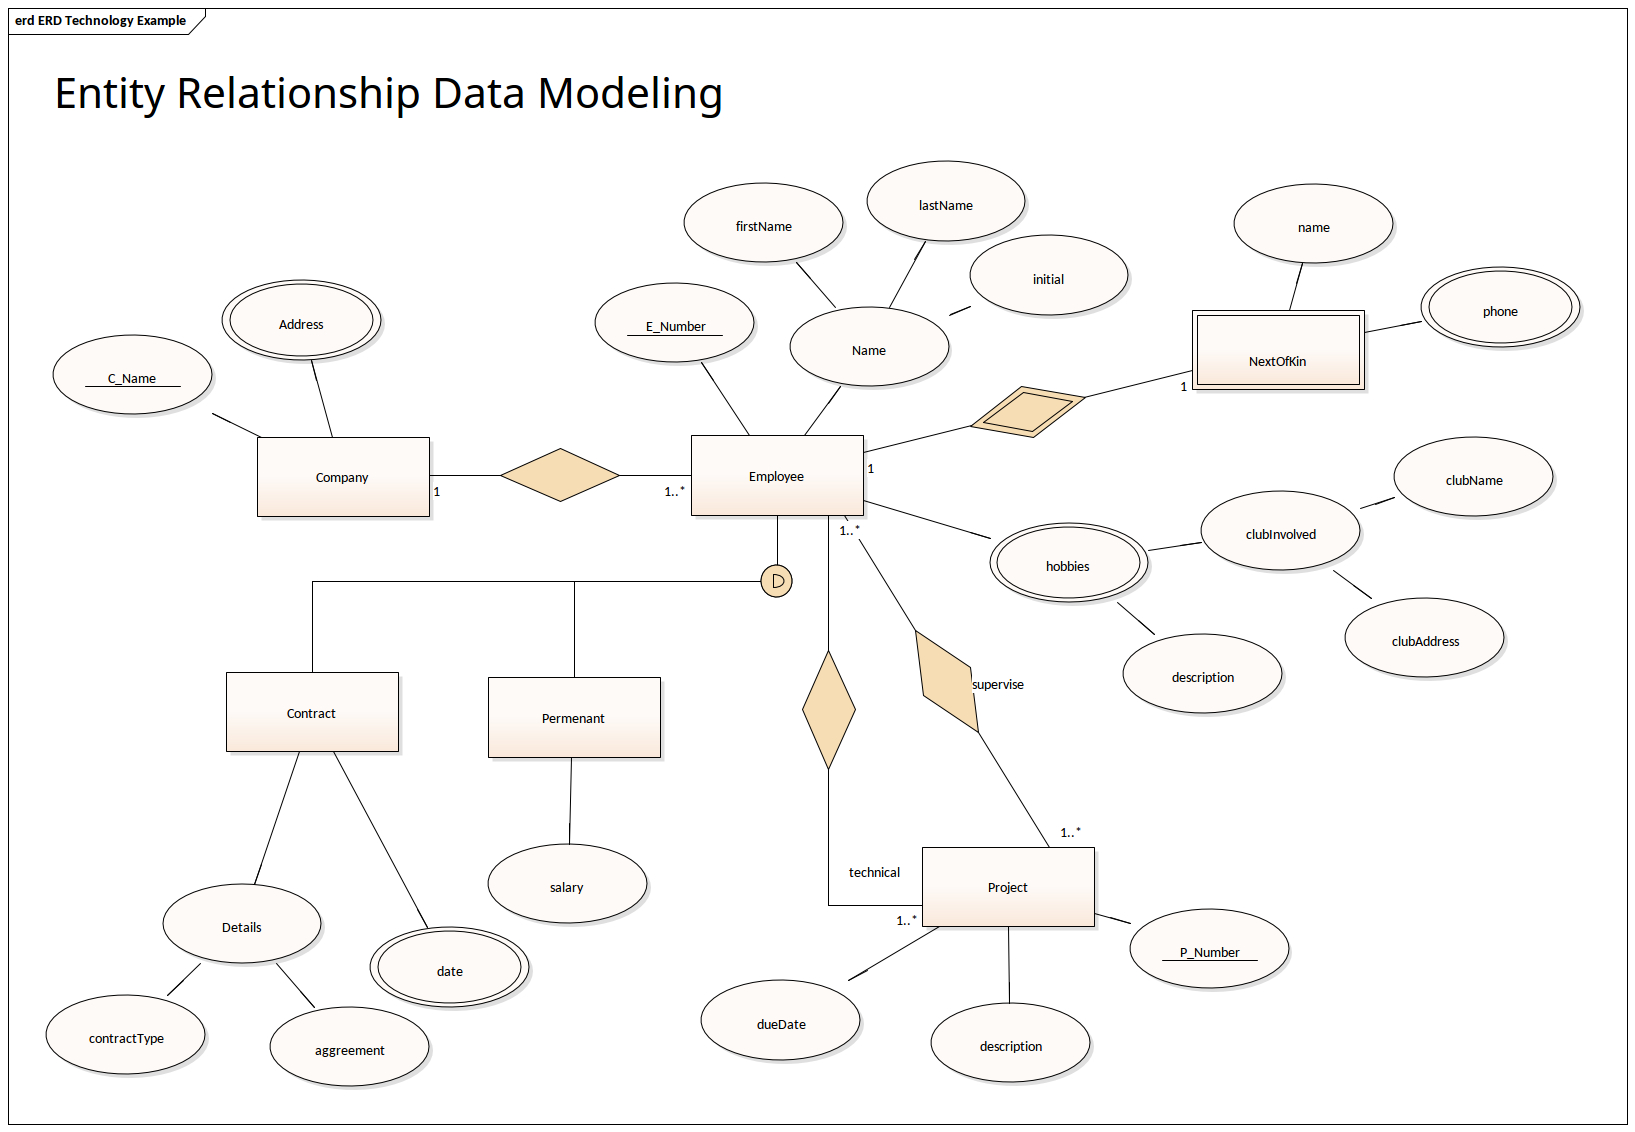 Entity Relationship Data Modeling   Enterprise Architect for Entity Relationship Model